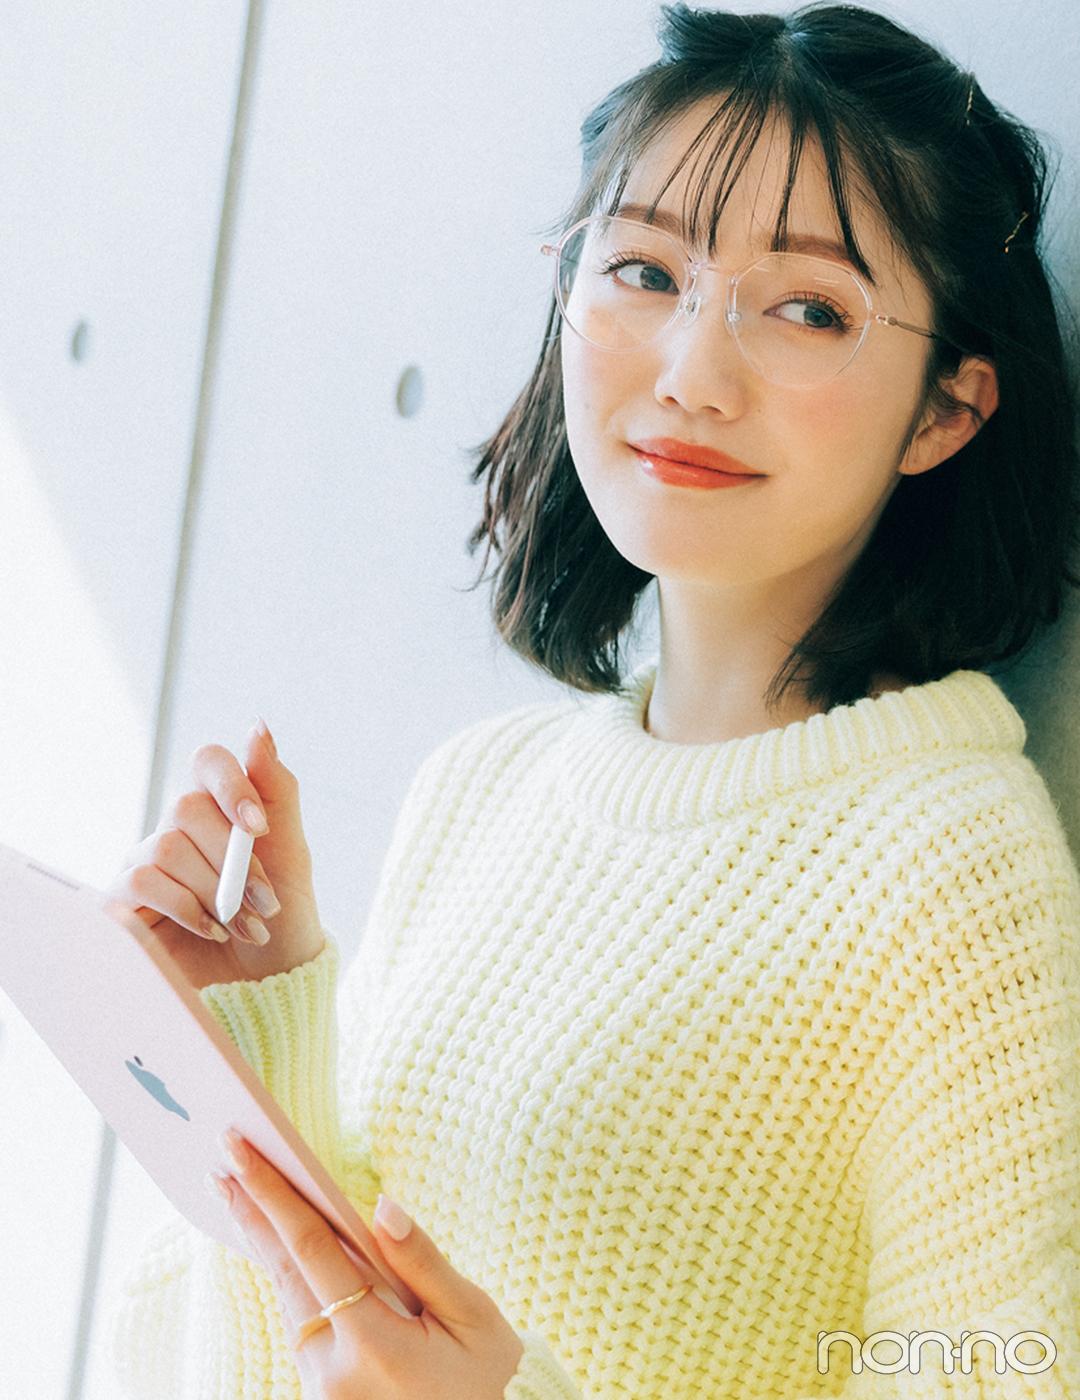 Photo Gallery ノンノモデル・松川菜々花 最新フォトギャラリー_1_6